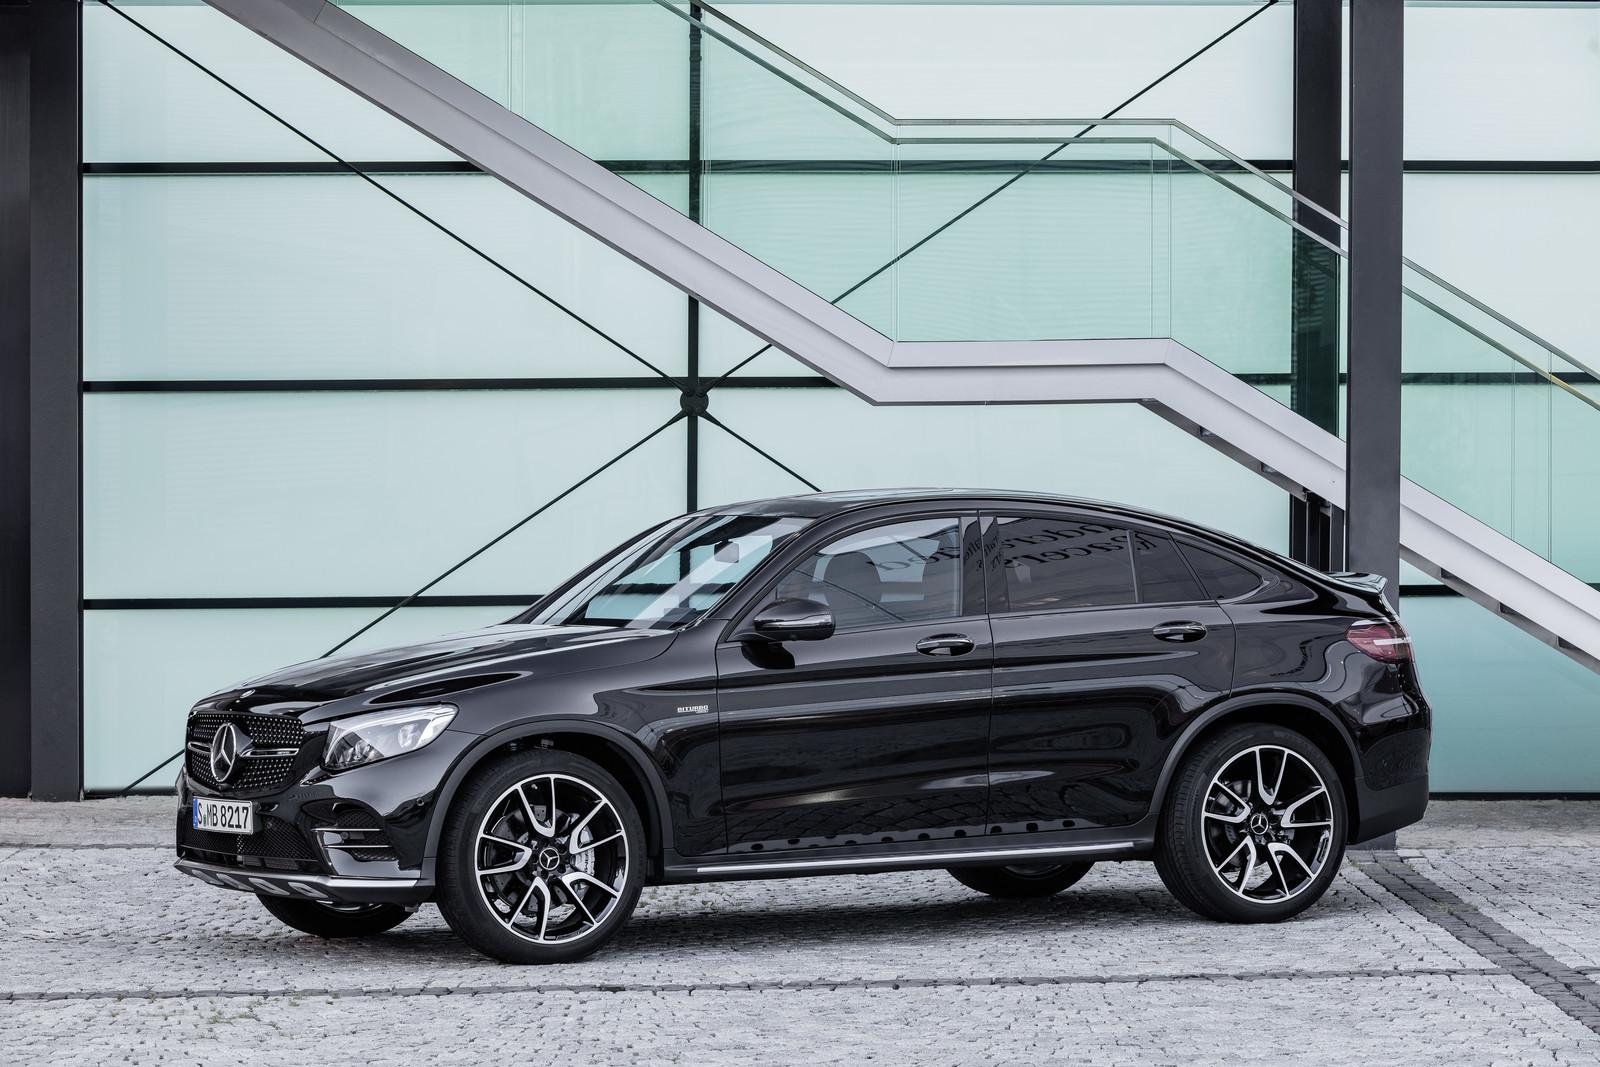 Foto de Mercedes-AMG GLC 43 4MATIC Coupé (11/24)